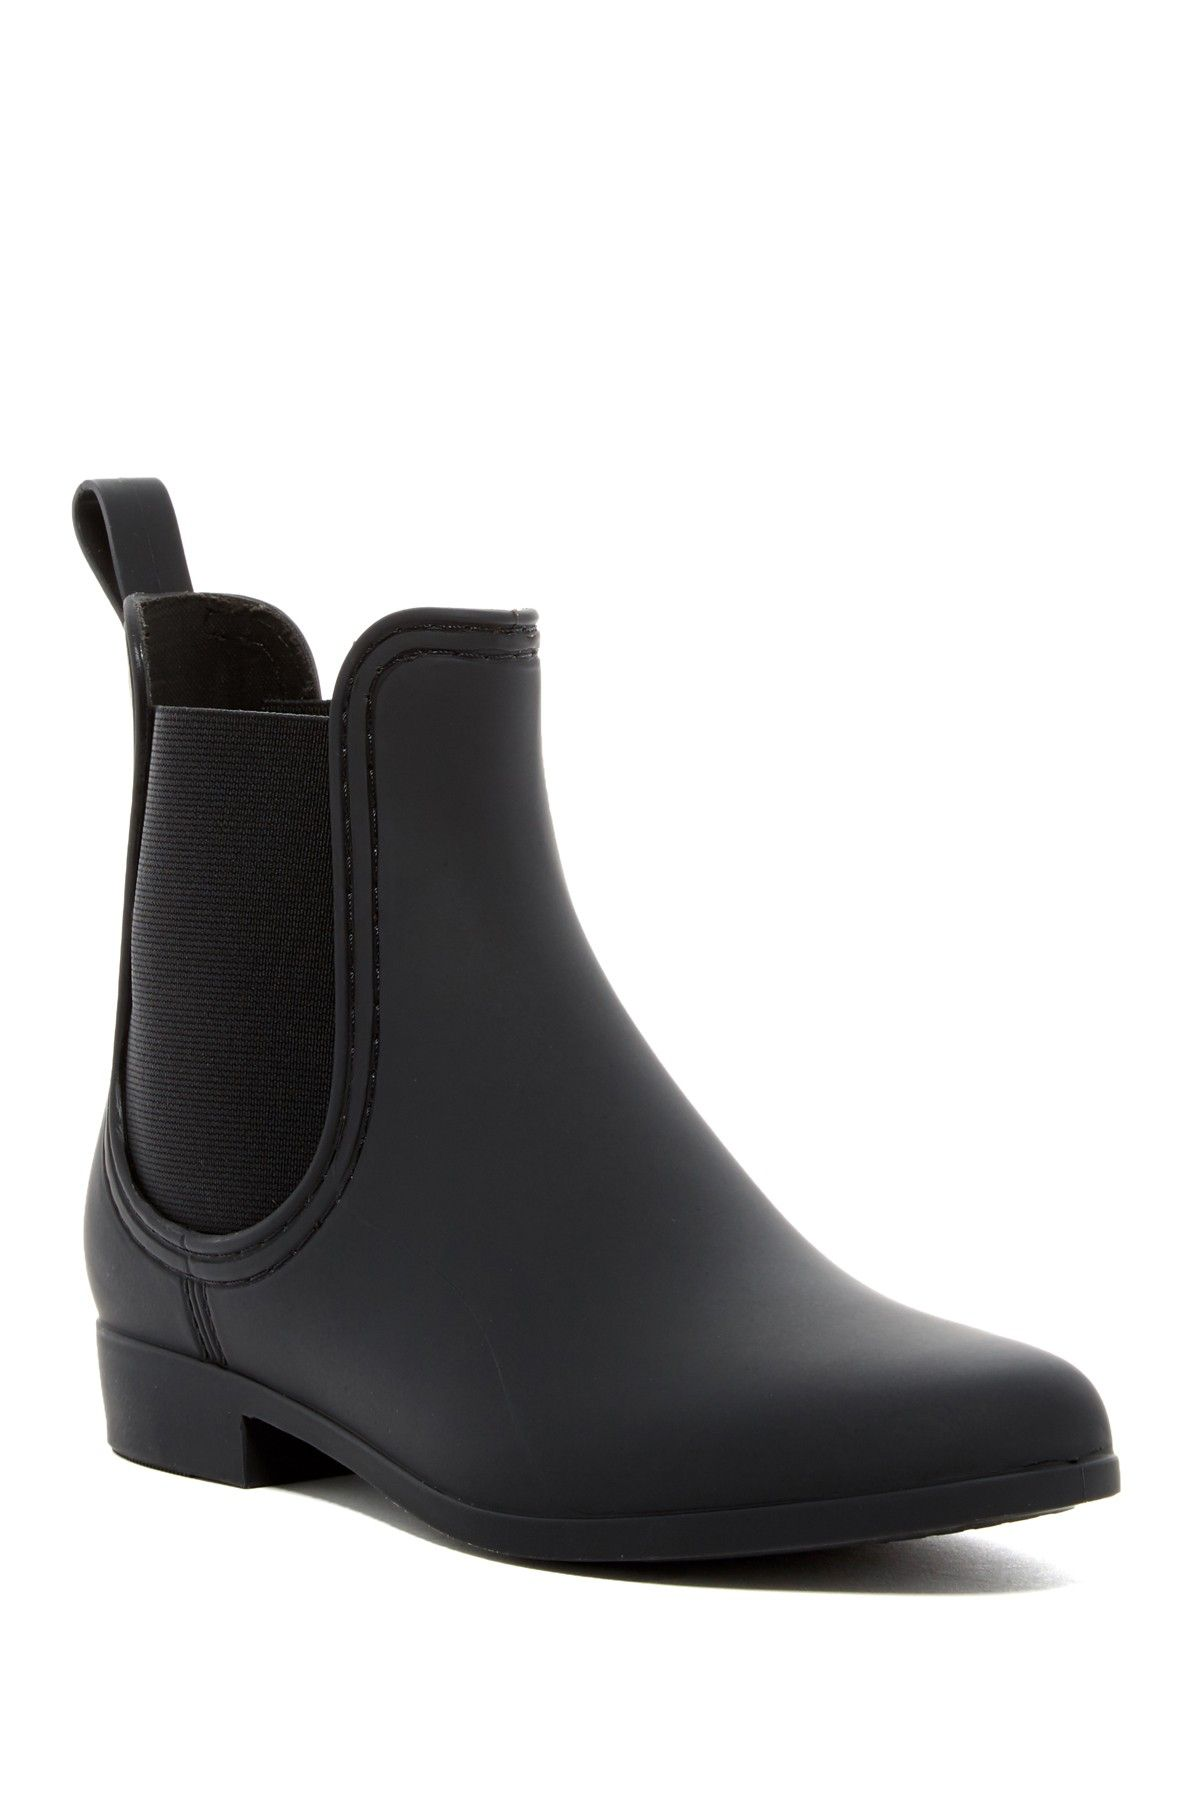 f49404bf00b Jeffrey Campbell - Forecast Chelsea Waterproof Rain Boot at Nordstrom Rack.  Free…